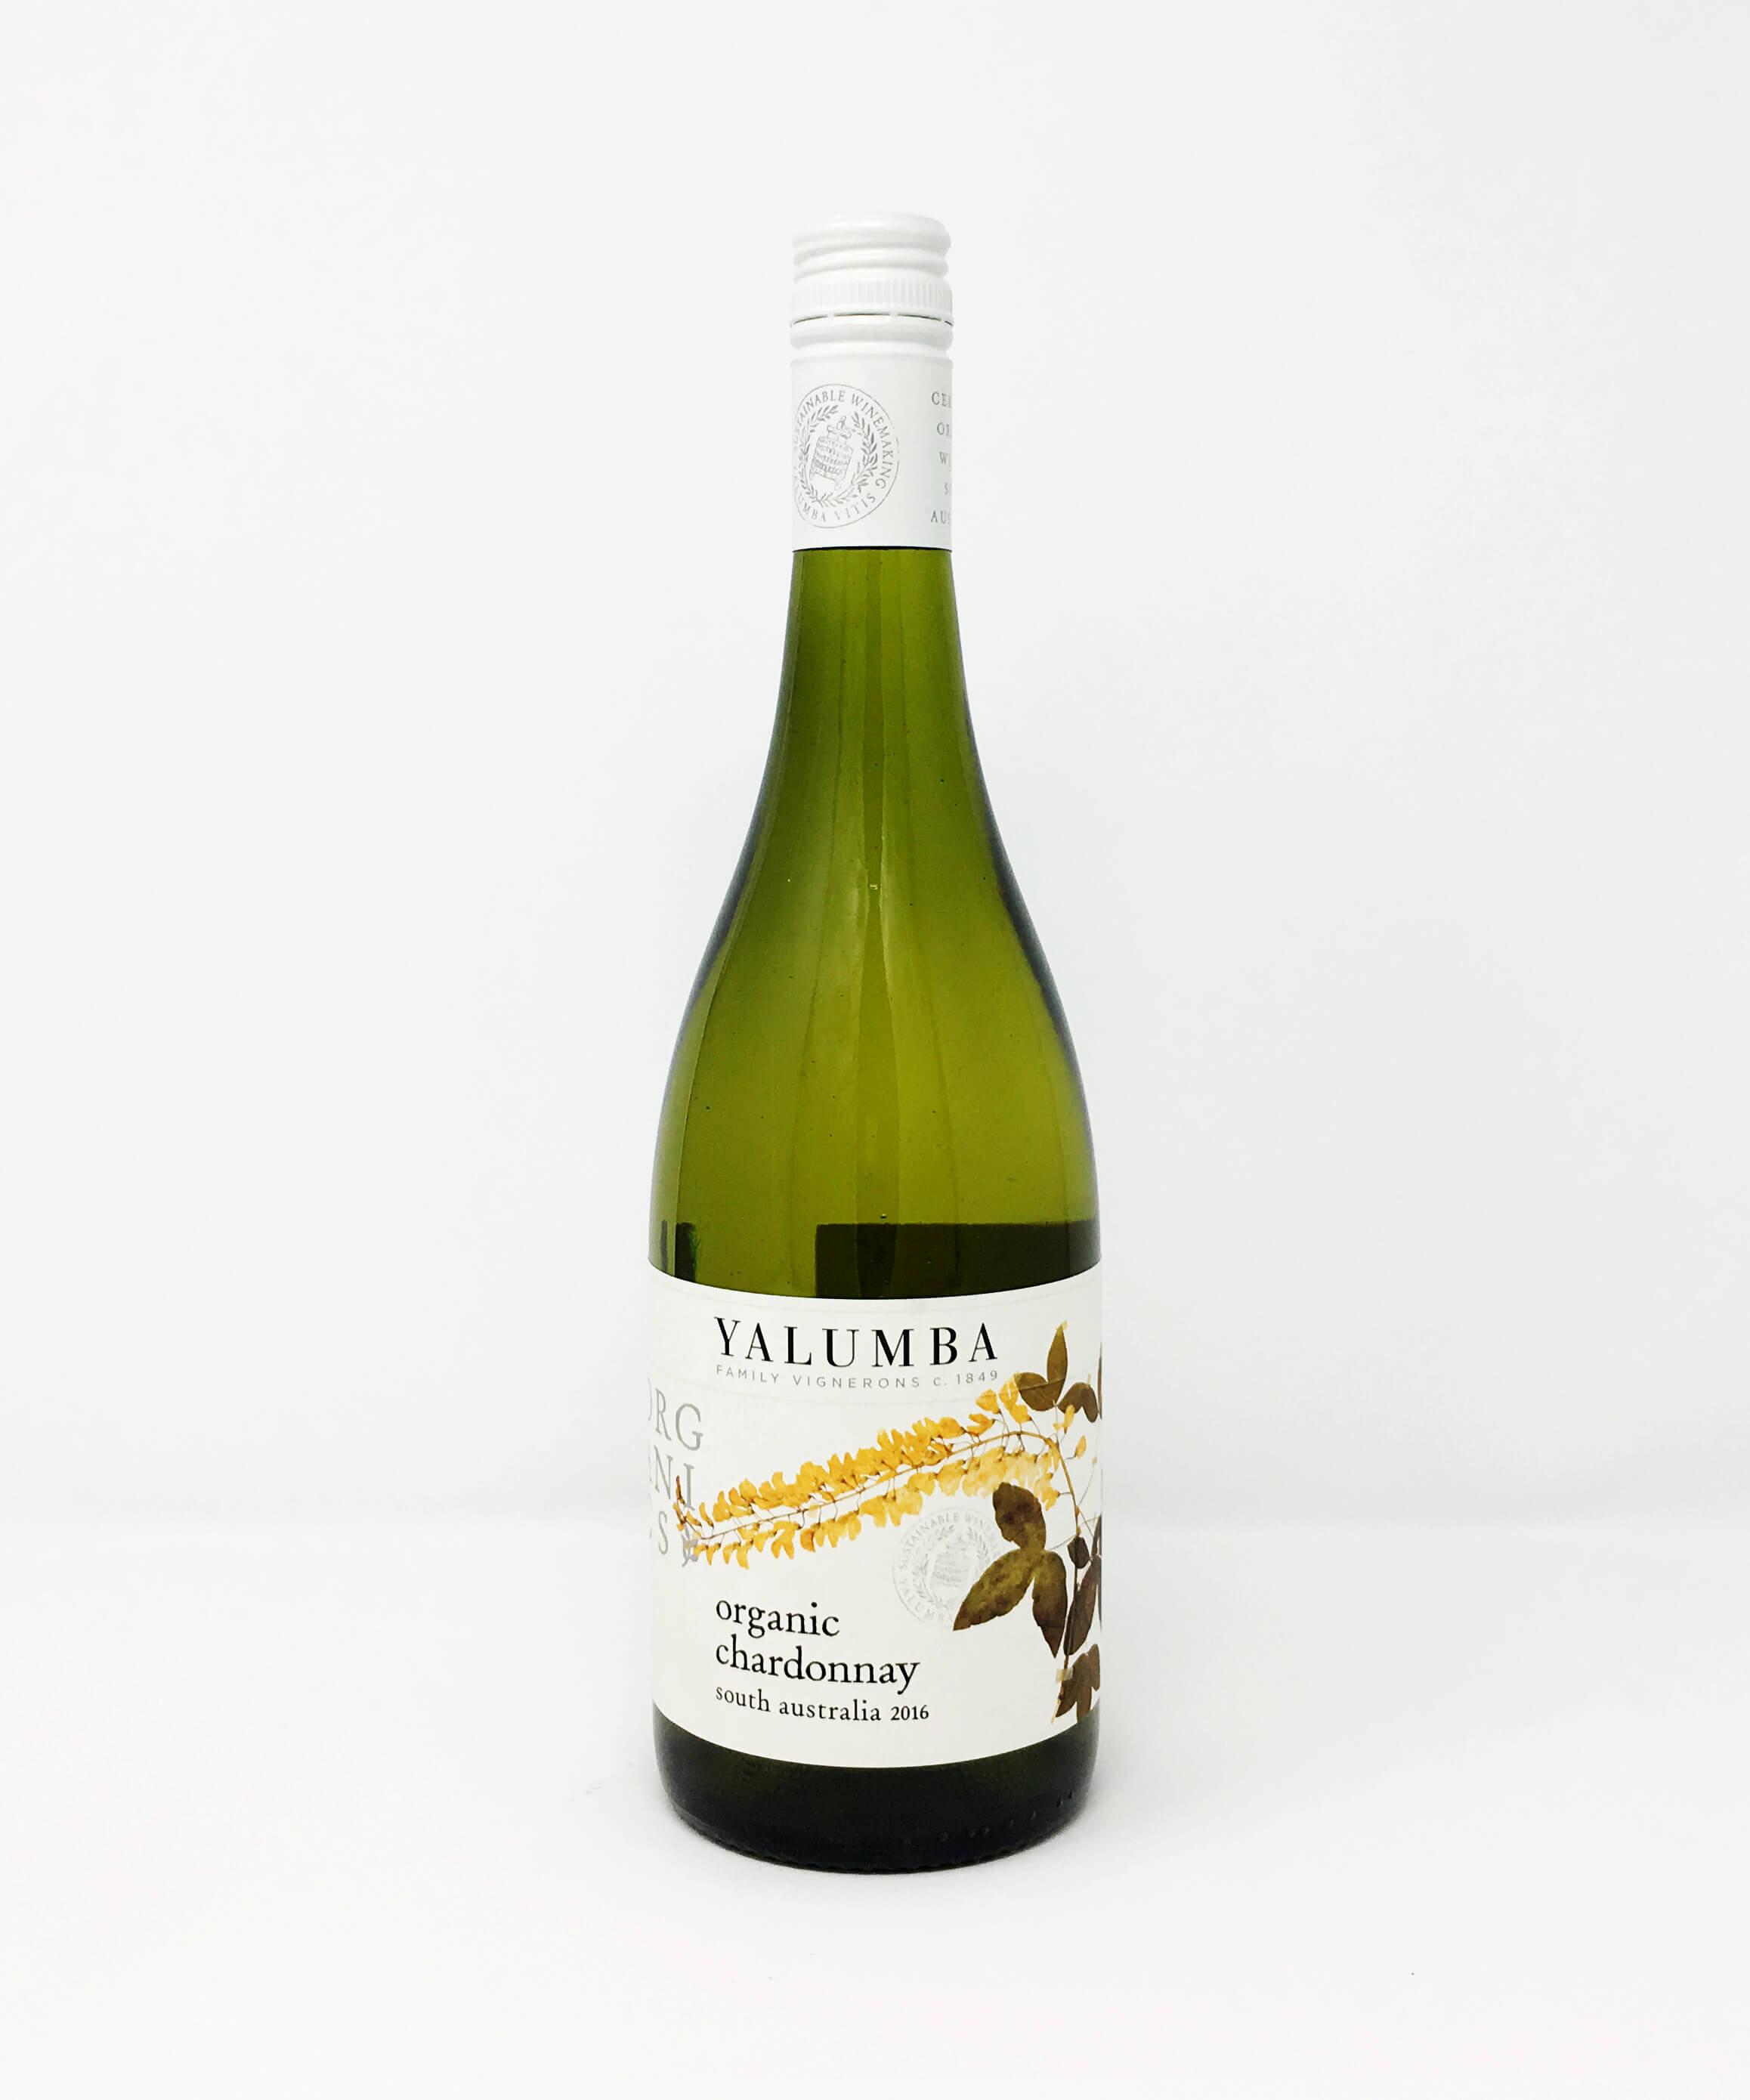 Yalumba, Organic Chardonnay